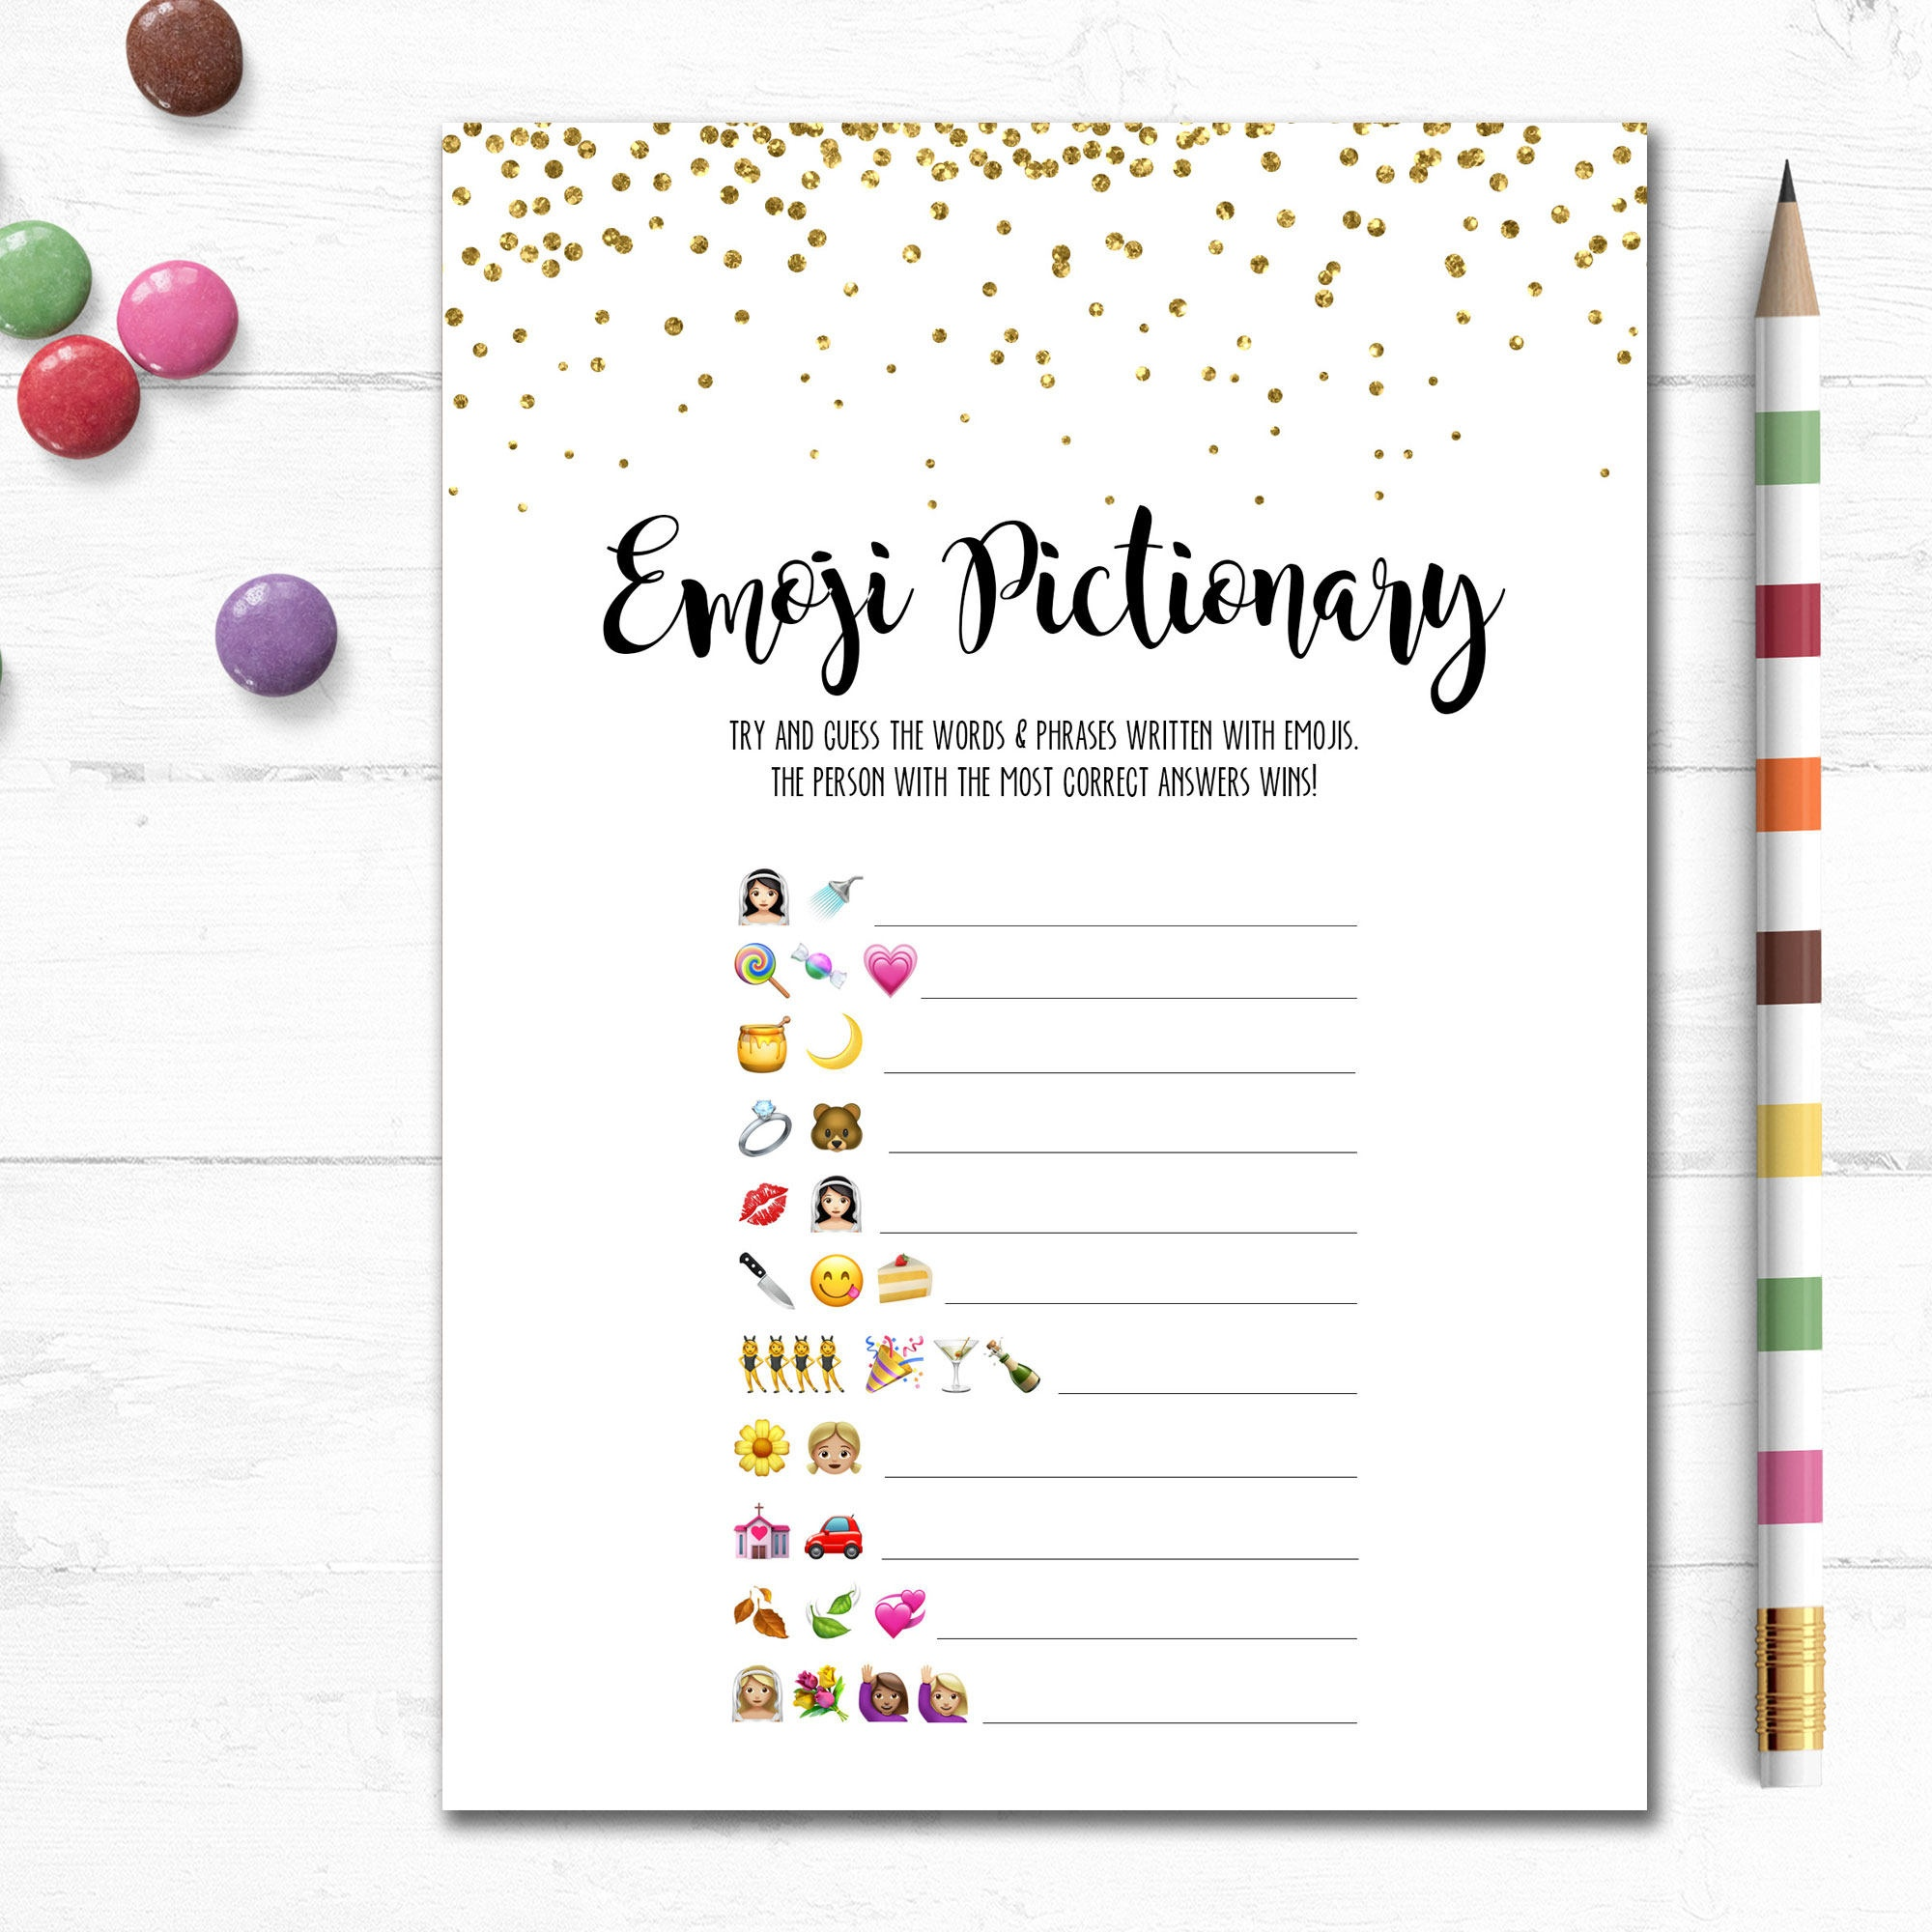 Printable Wedding Emoji Pictionary Bridal Shower Game Bridal | Etsy - Wedding Emoji Pictionary Free Printable